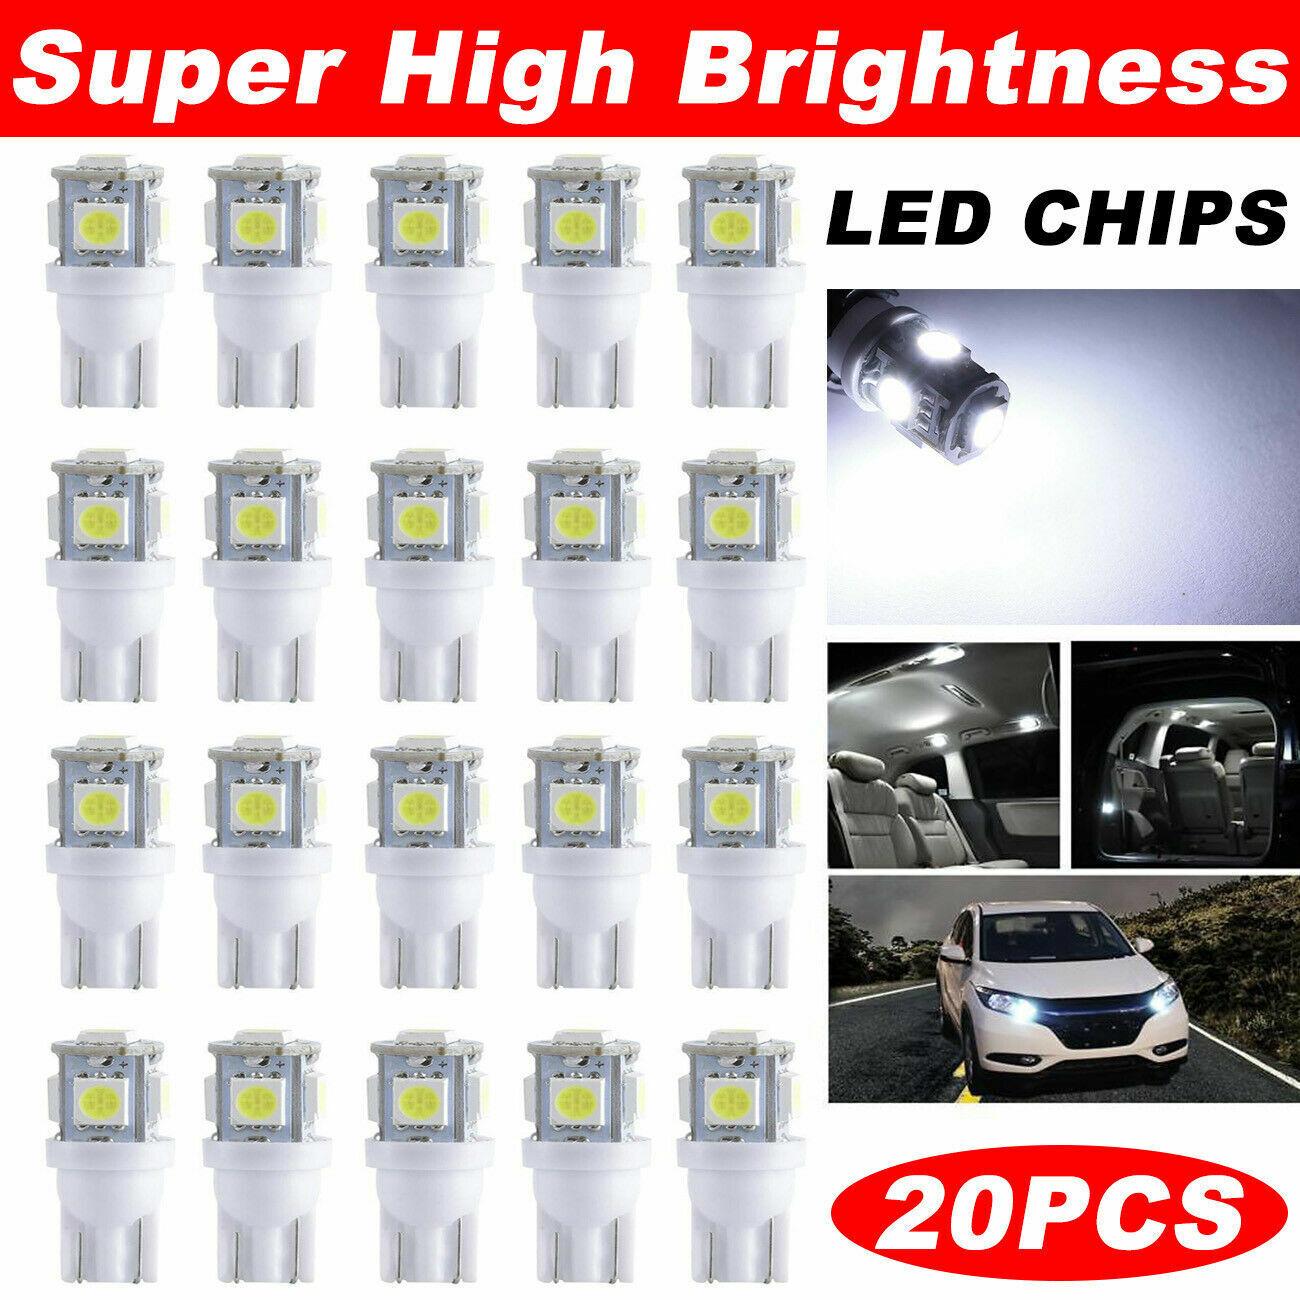 10Pcs T10 5050 5SMD White LED Car Light Wedge Lamp Bulbs Super Bright DC 12V HOT